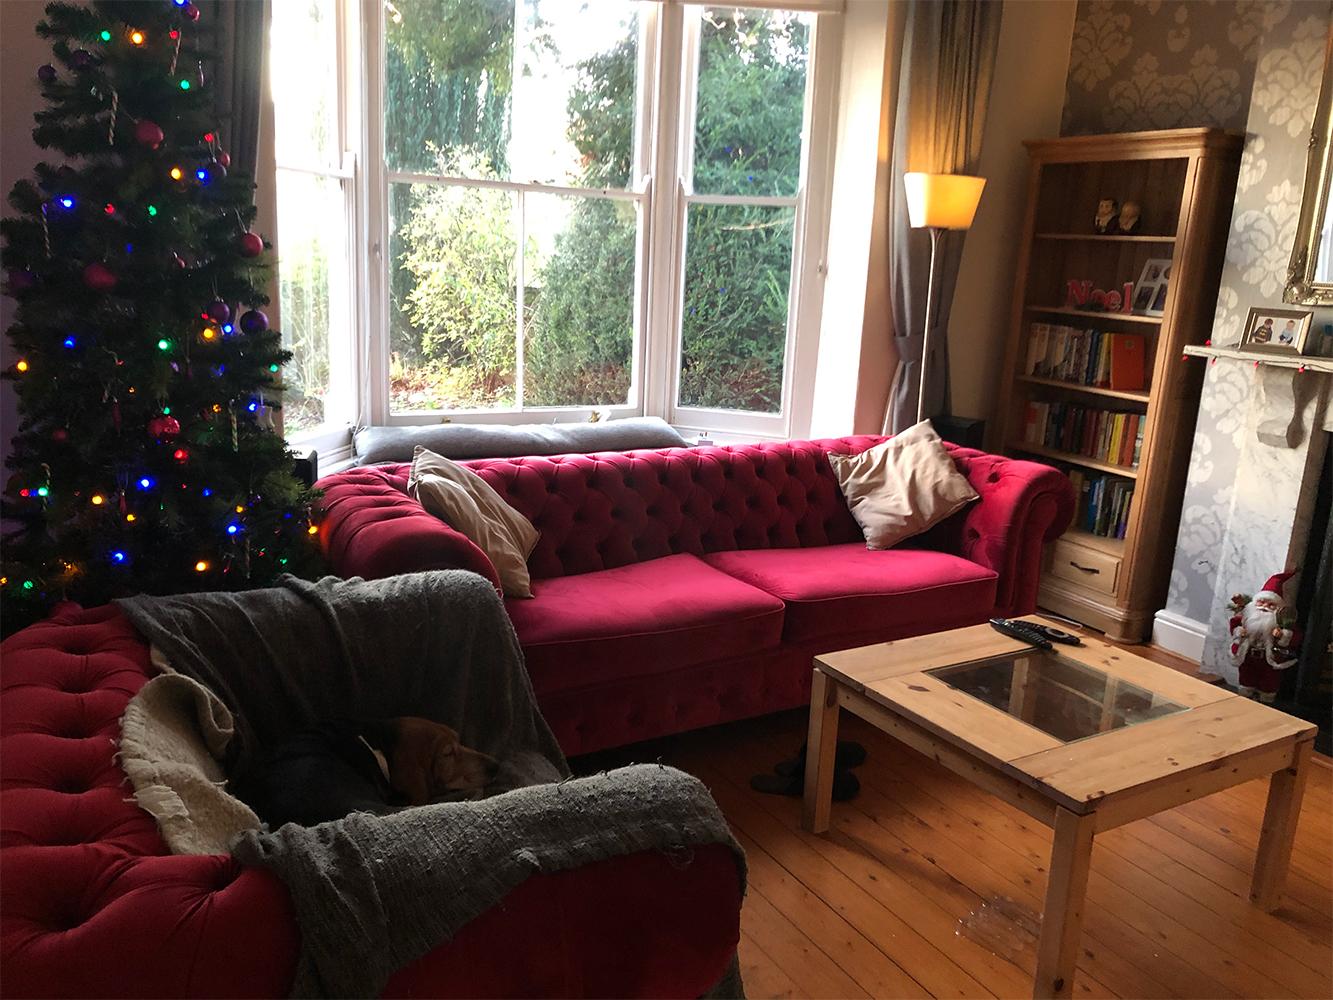 Dunkelrotes Sofa und gepolsterter Sessel Chesterfield Max